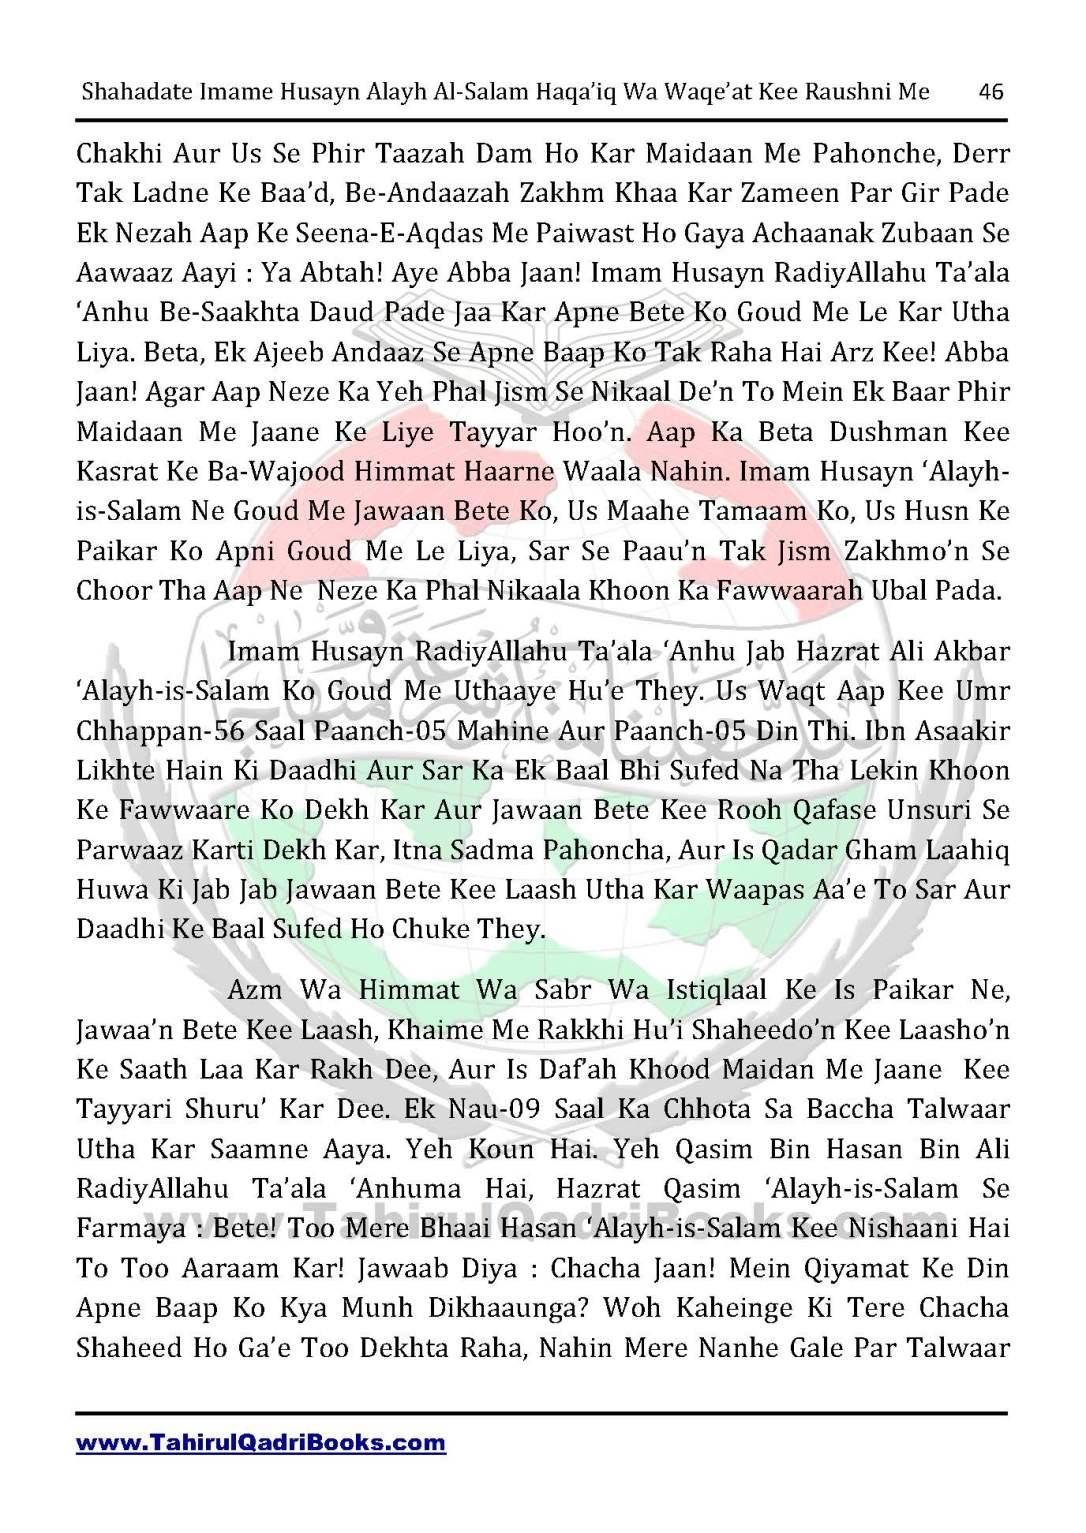 shahadate-imame-husayn-alayh-is-salam-haqaiq-wa-waqe_at-kee-raushni-me-in-roman-urdu-unlocked_Page_46